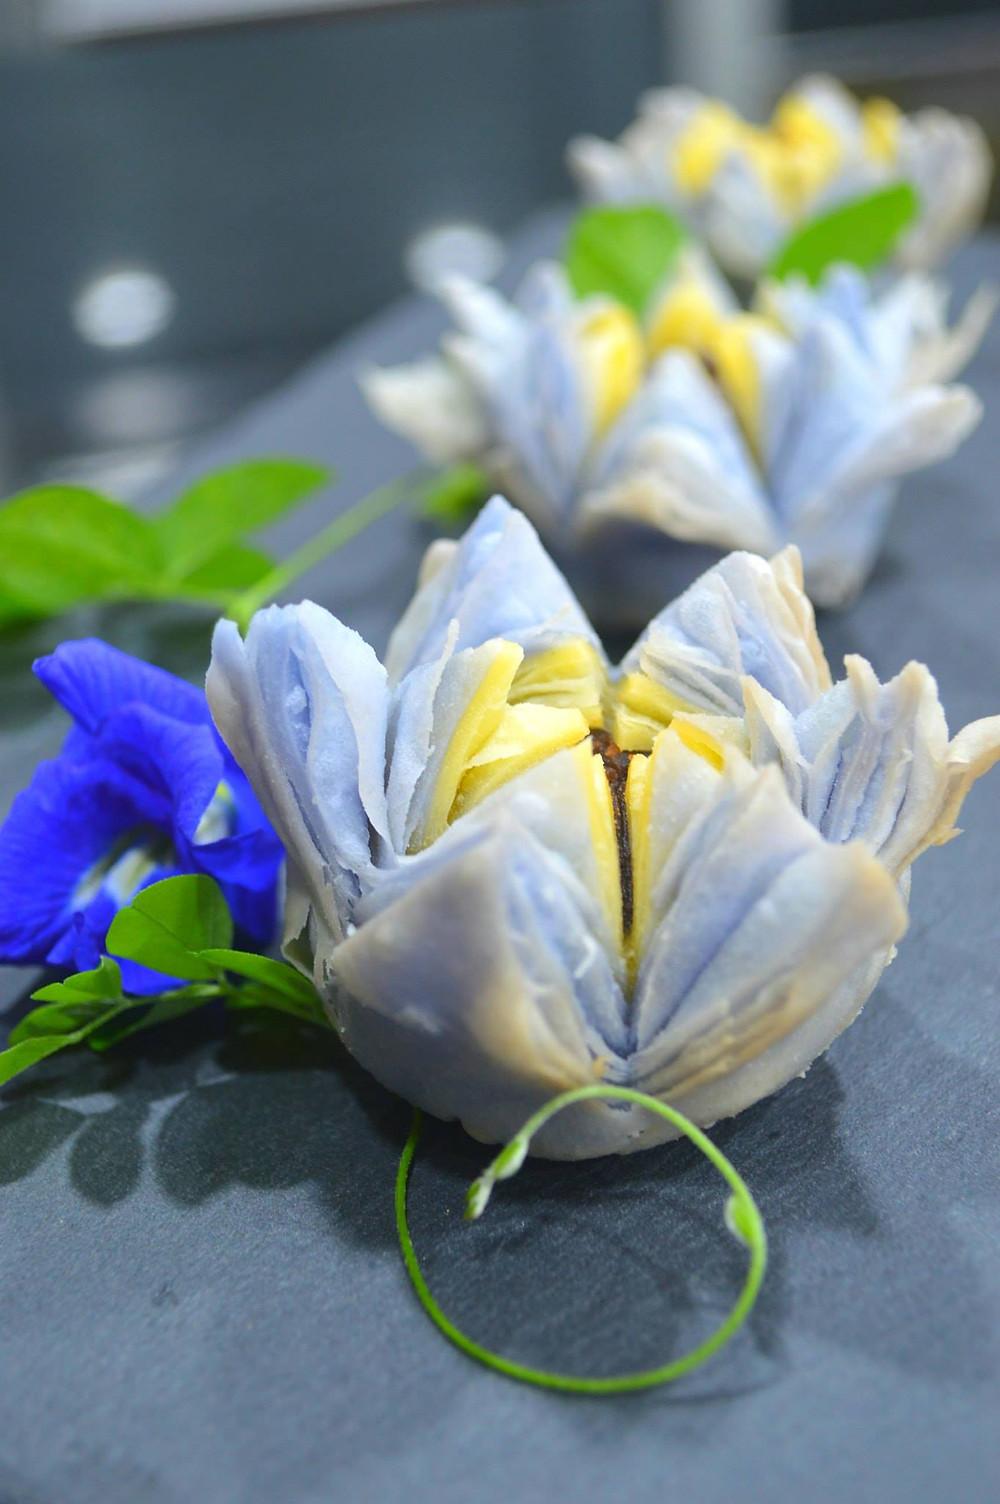 Blue Lotus Flower recipe | Loh Poh Peang | My Blue Tea